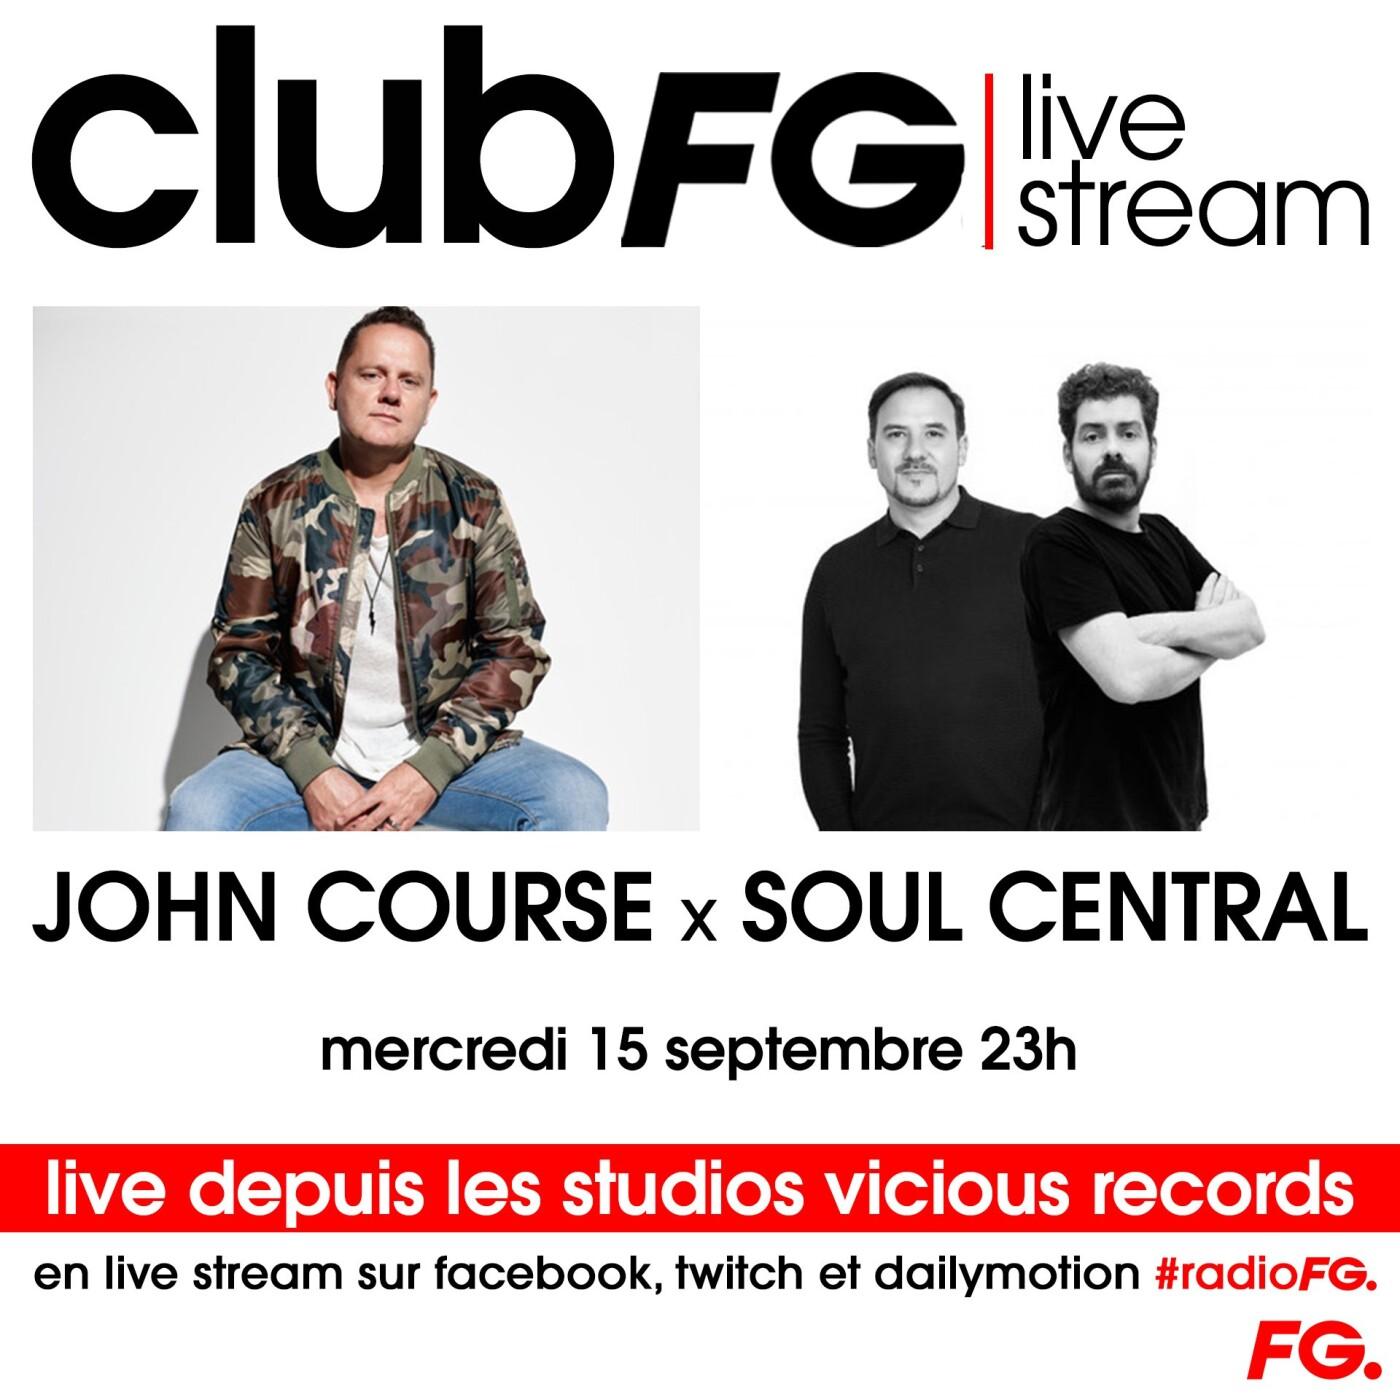 CLUB FG LIVE STREAM : JOHN COURSE & SOUL CENTRAL